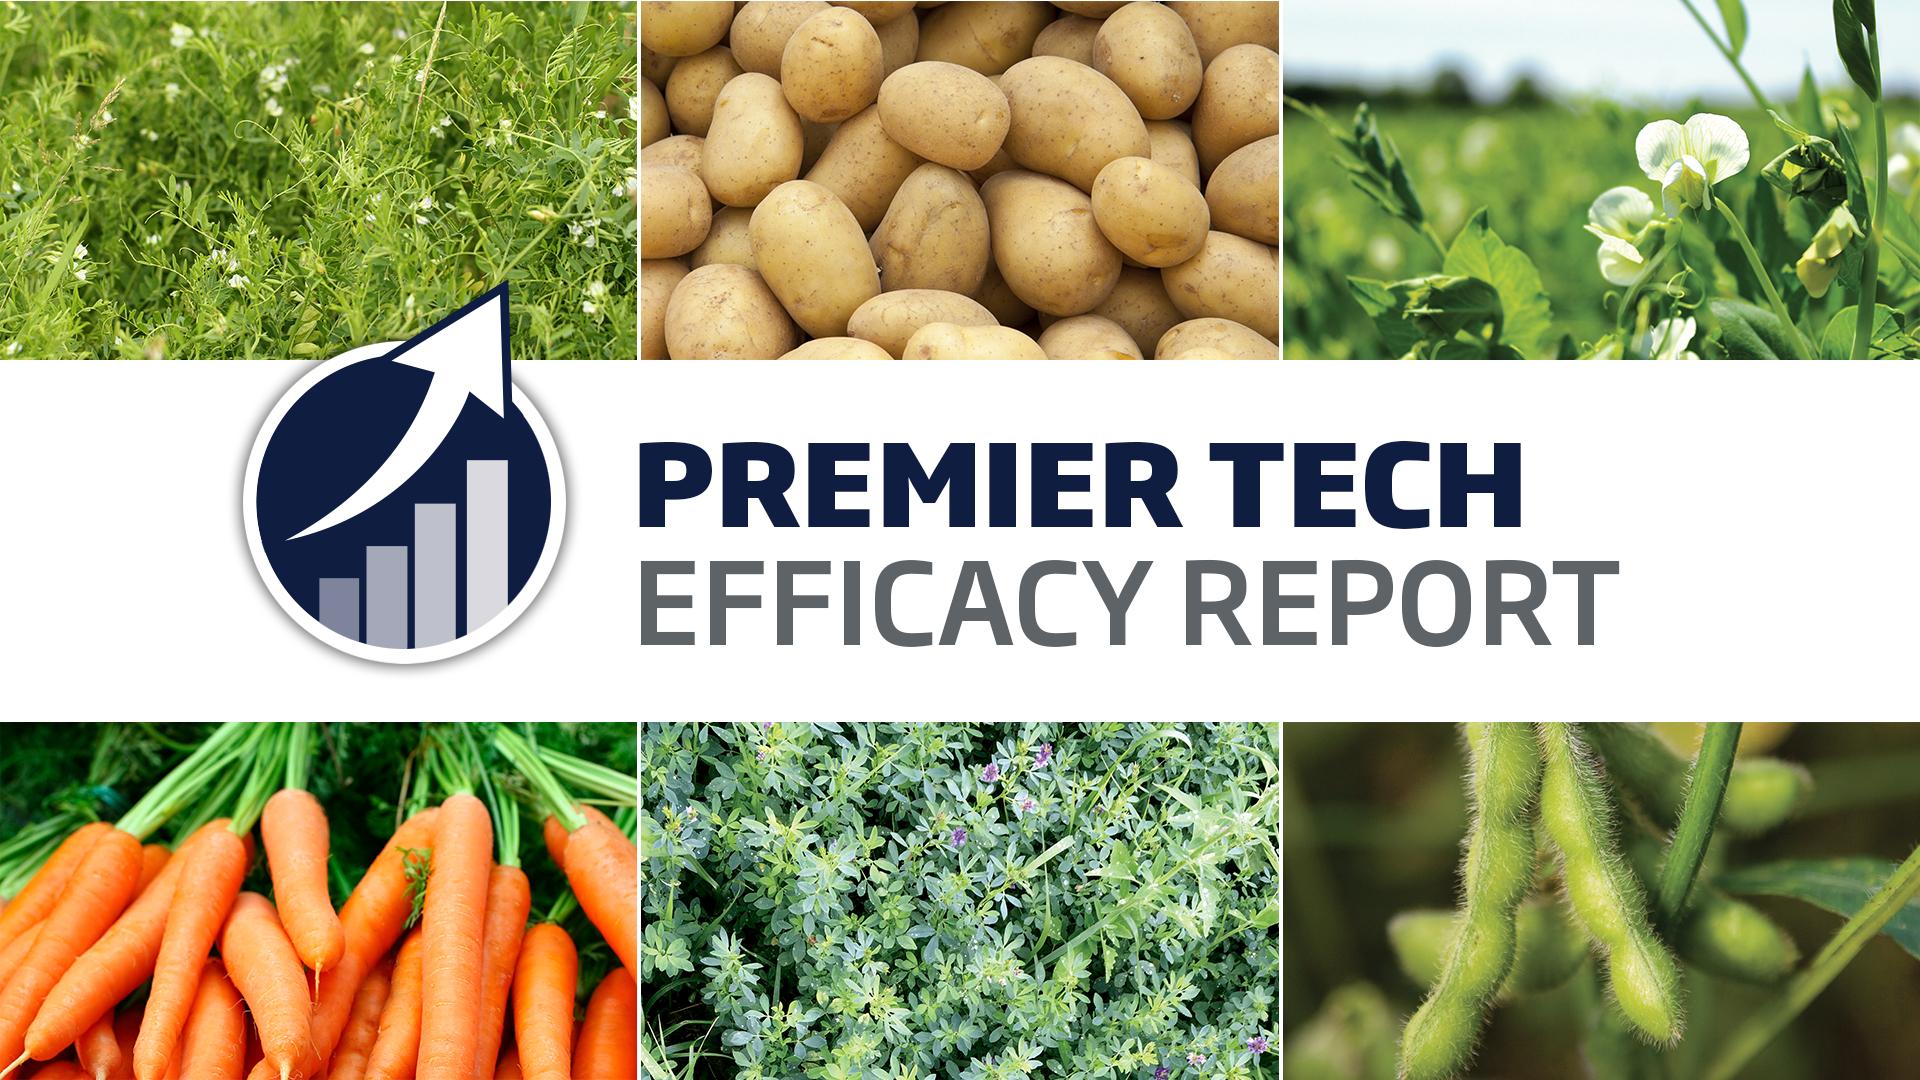 2017 Premier Tech Efficacy Report